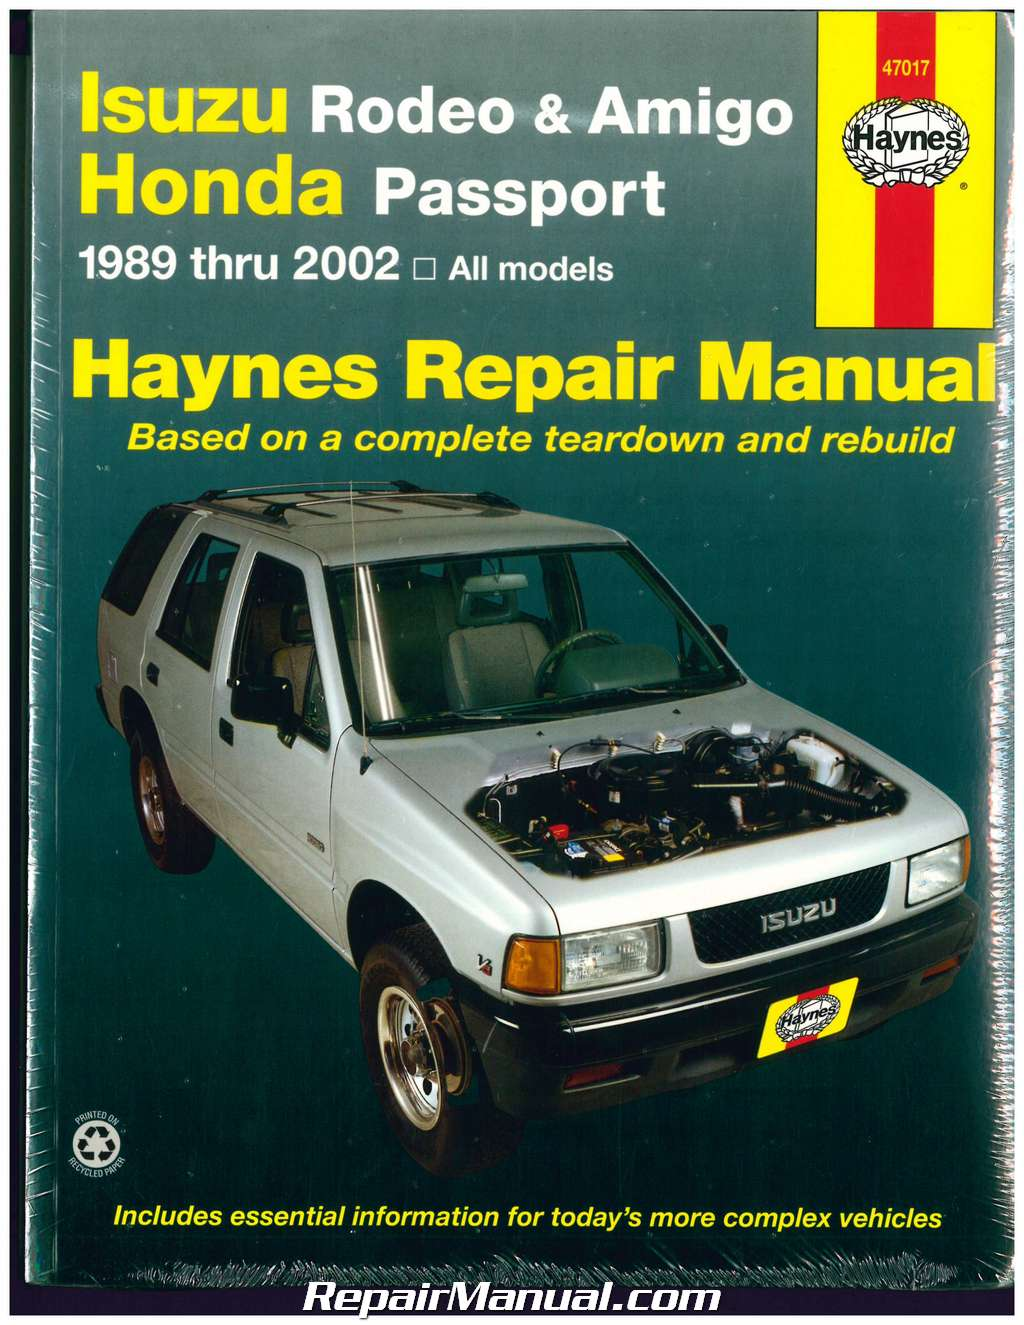 Isuzu Rodeo Amigo Honda Passport 1989 2002 Haynes